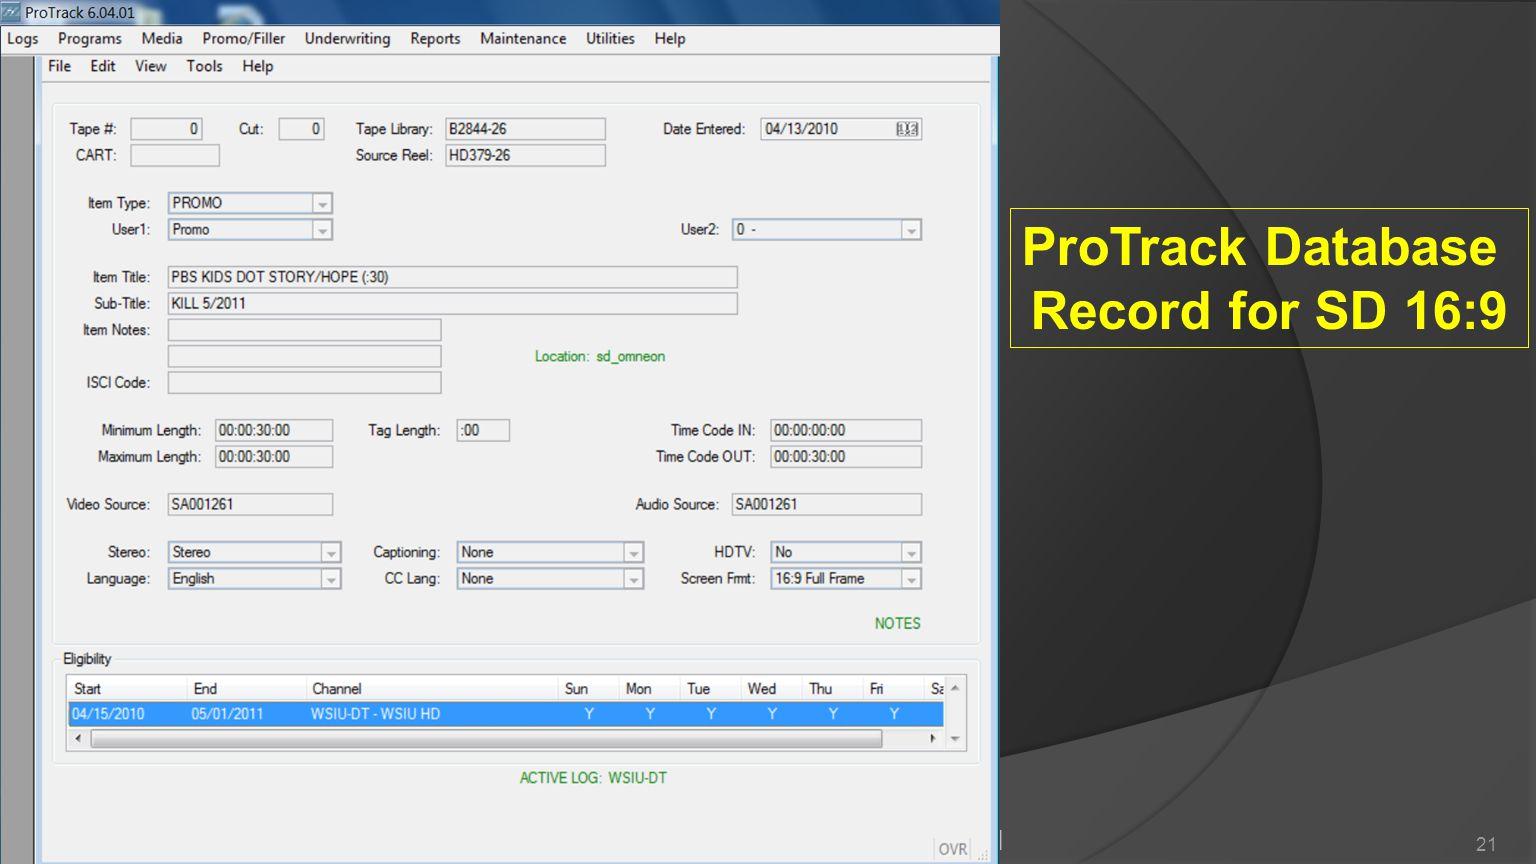 Q G NETA QG Workshop January 13, 2011 21 ProTrack Database Record for SD 16:9